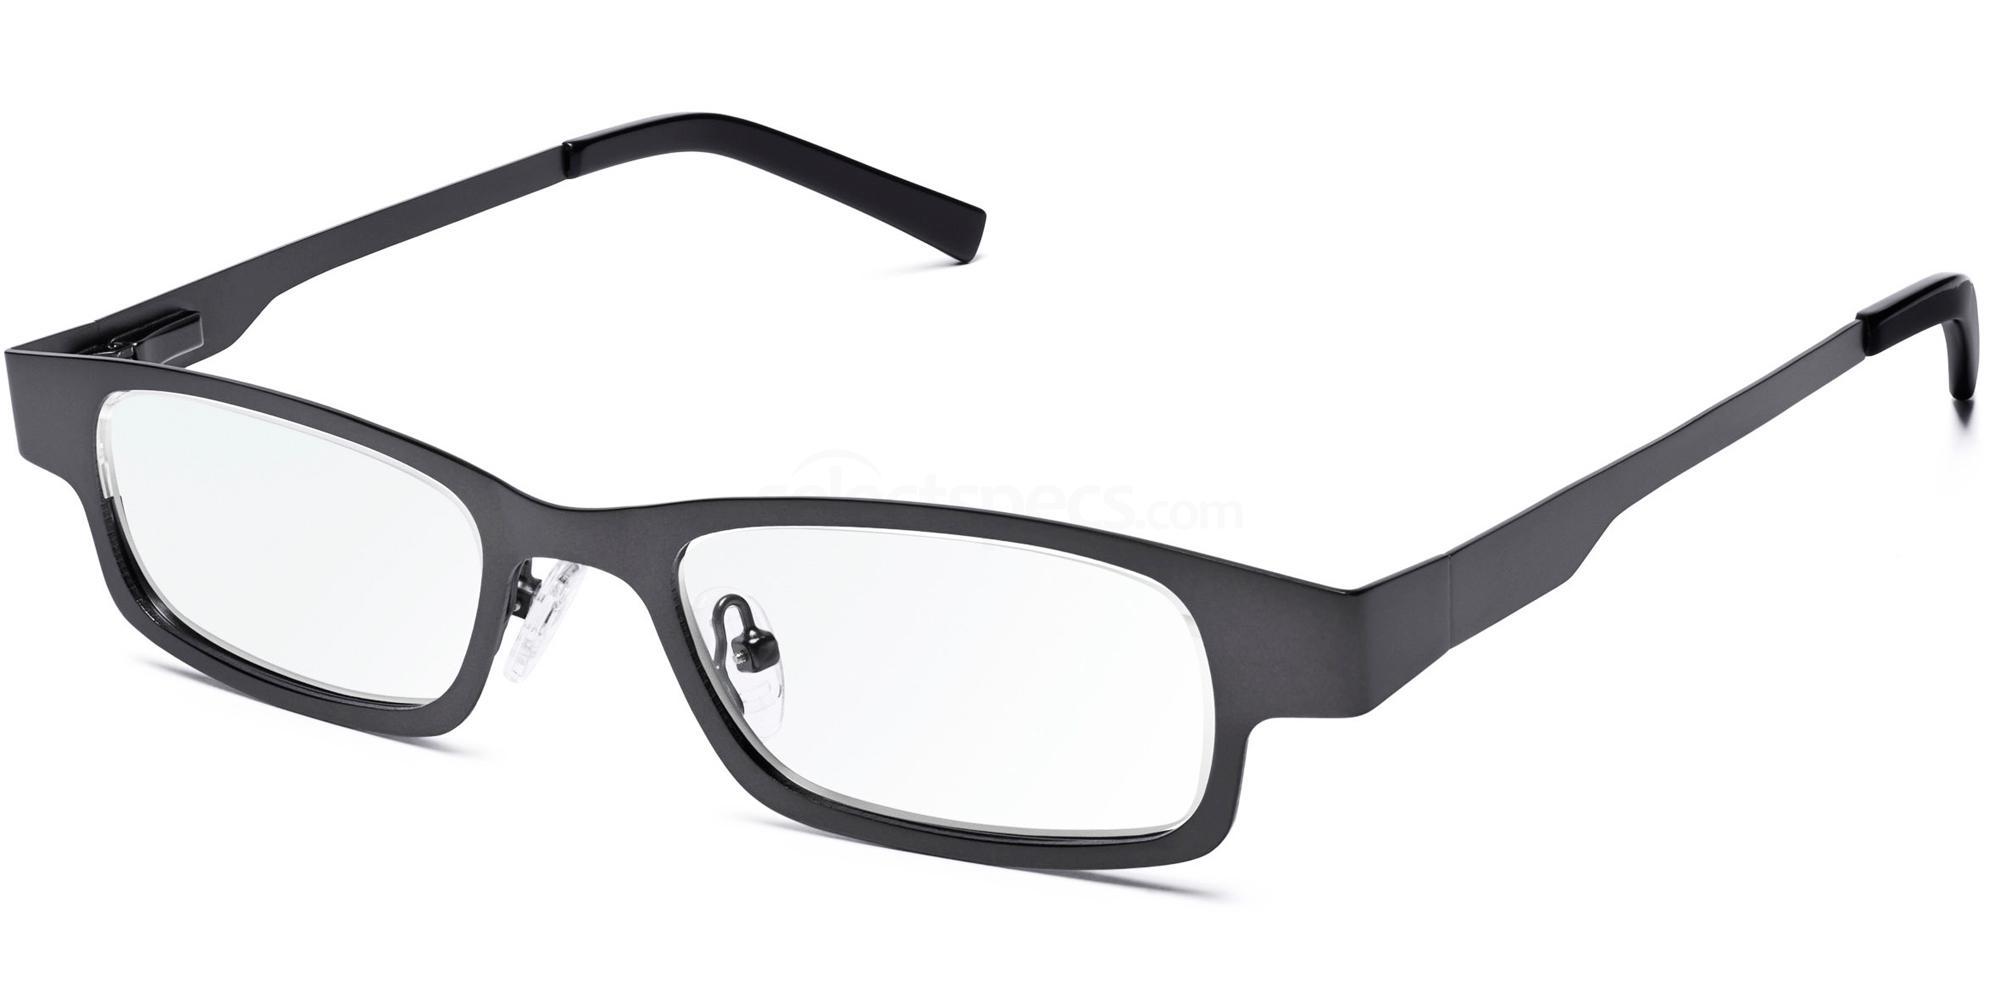 GUNMETAL Stainless Steel - lens strength adjustable between +0.50 to +4.00 D Accessories, Eyejusters